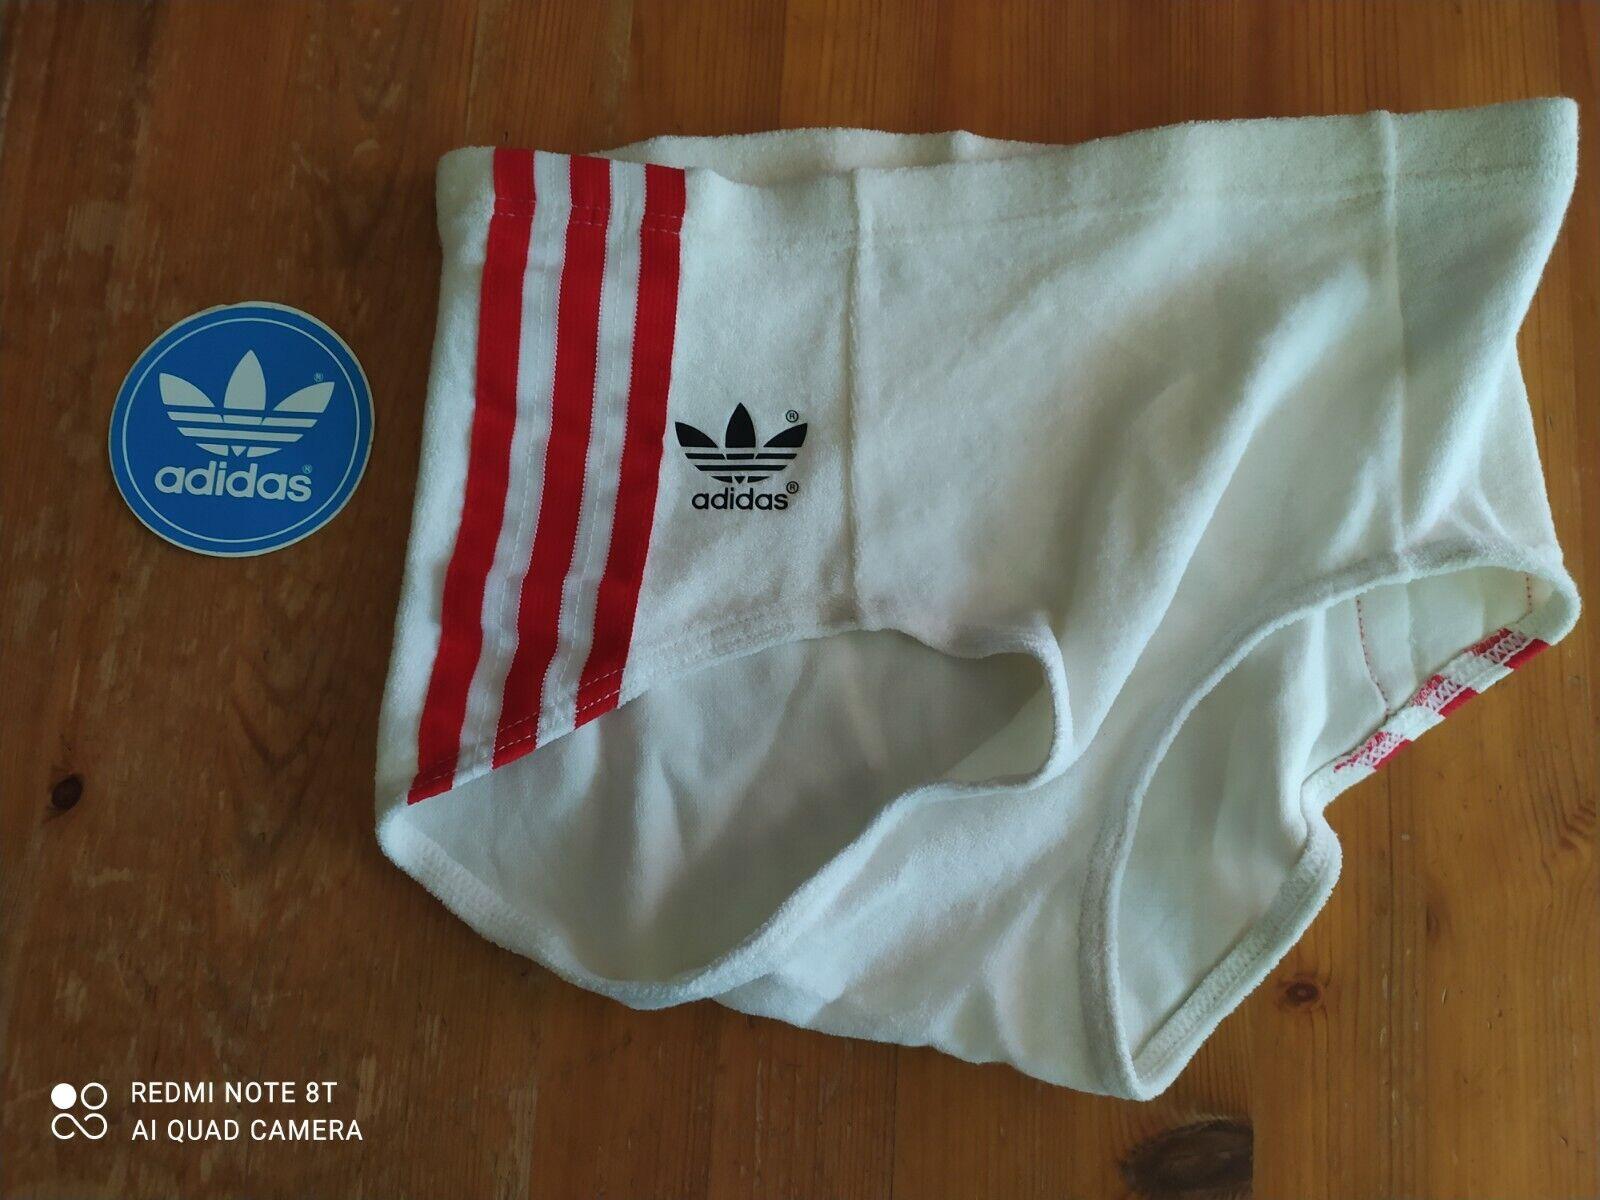 Adidas Classic Vintage Shorts NEU Ungetragen XS D2